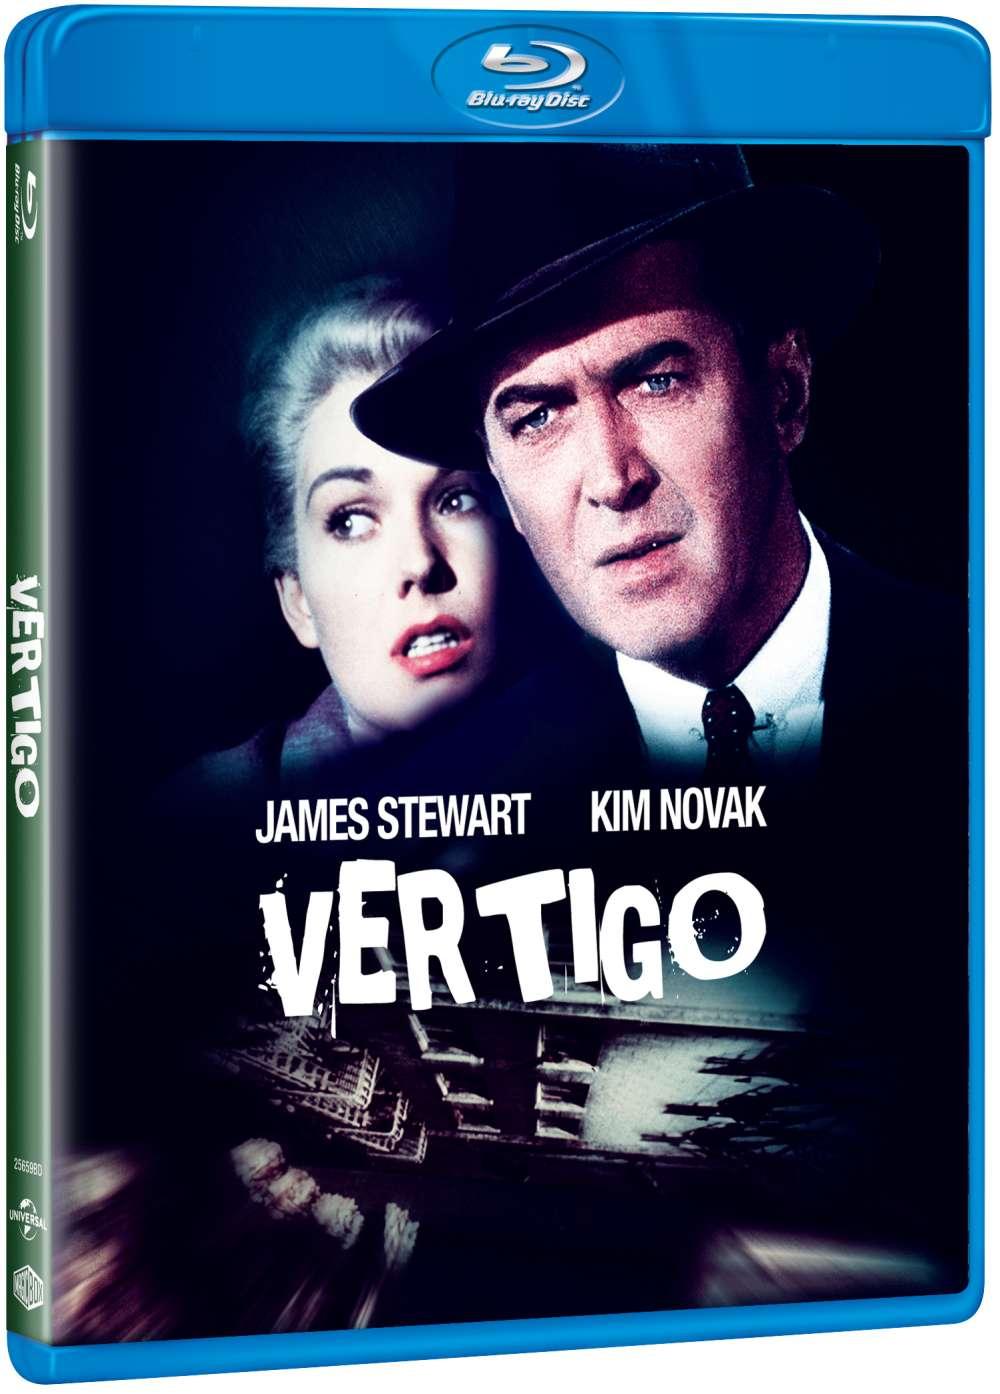 VERTIGO - Blu-ray